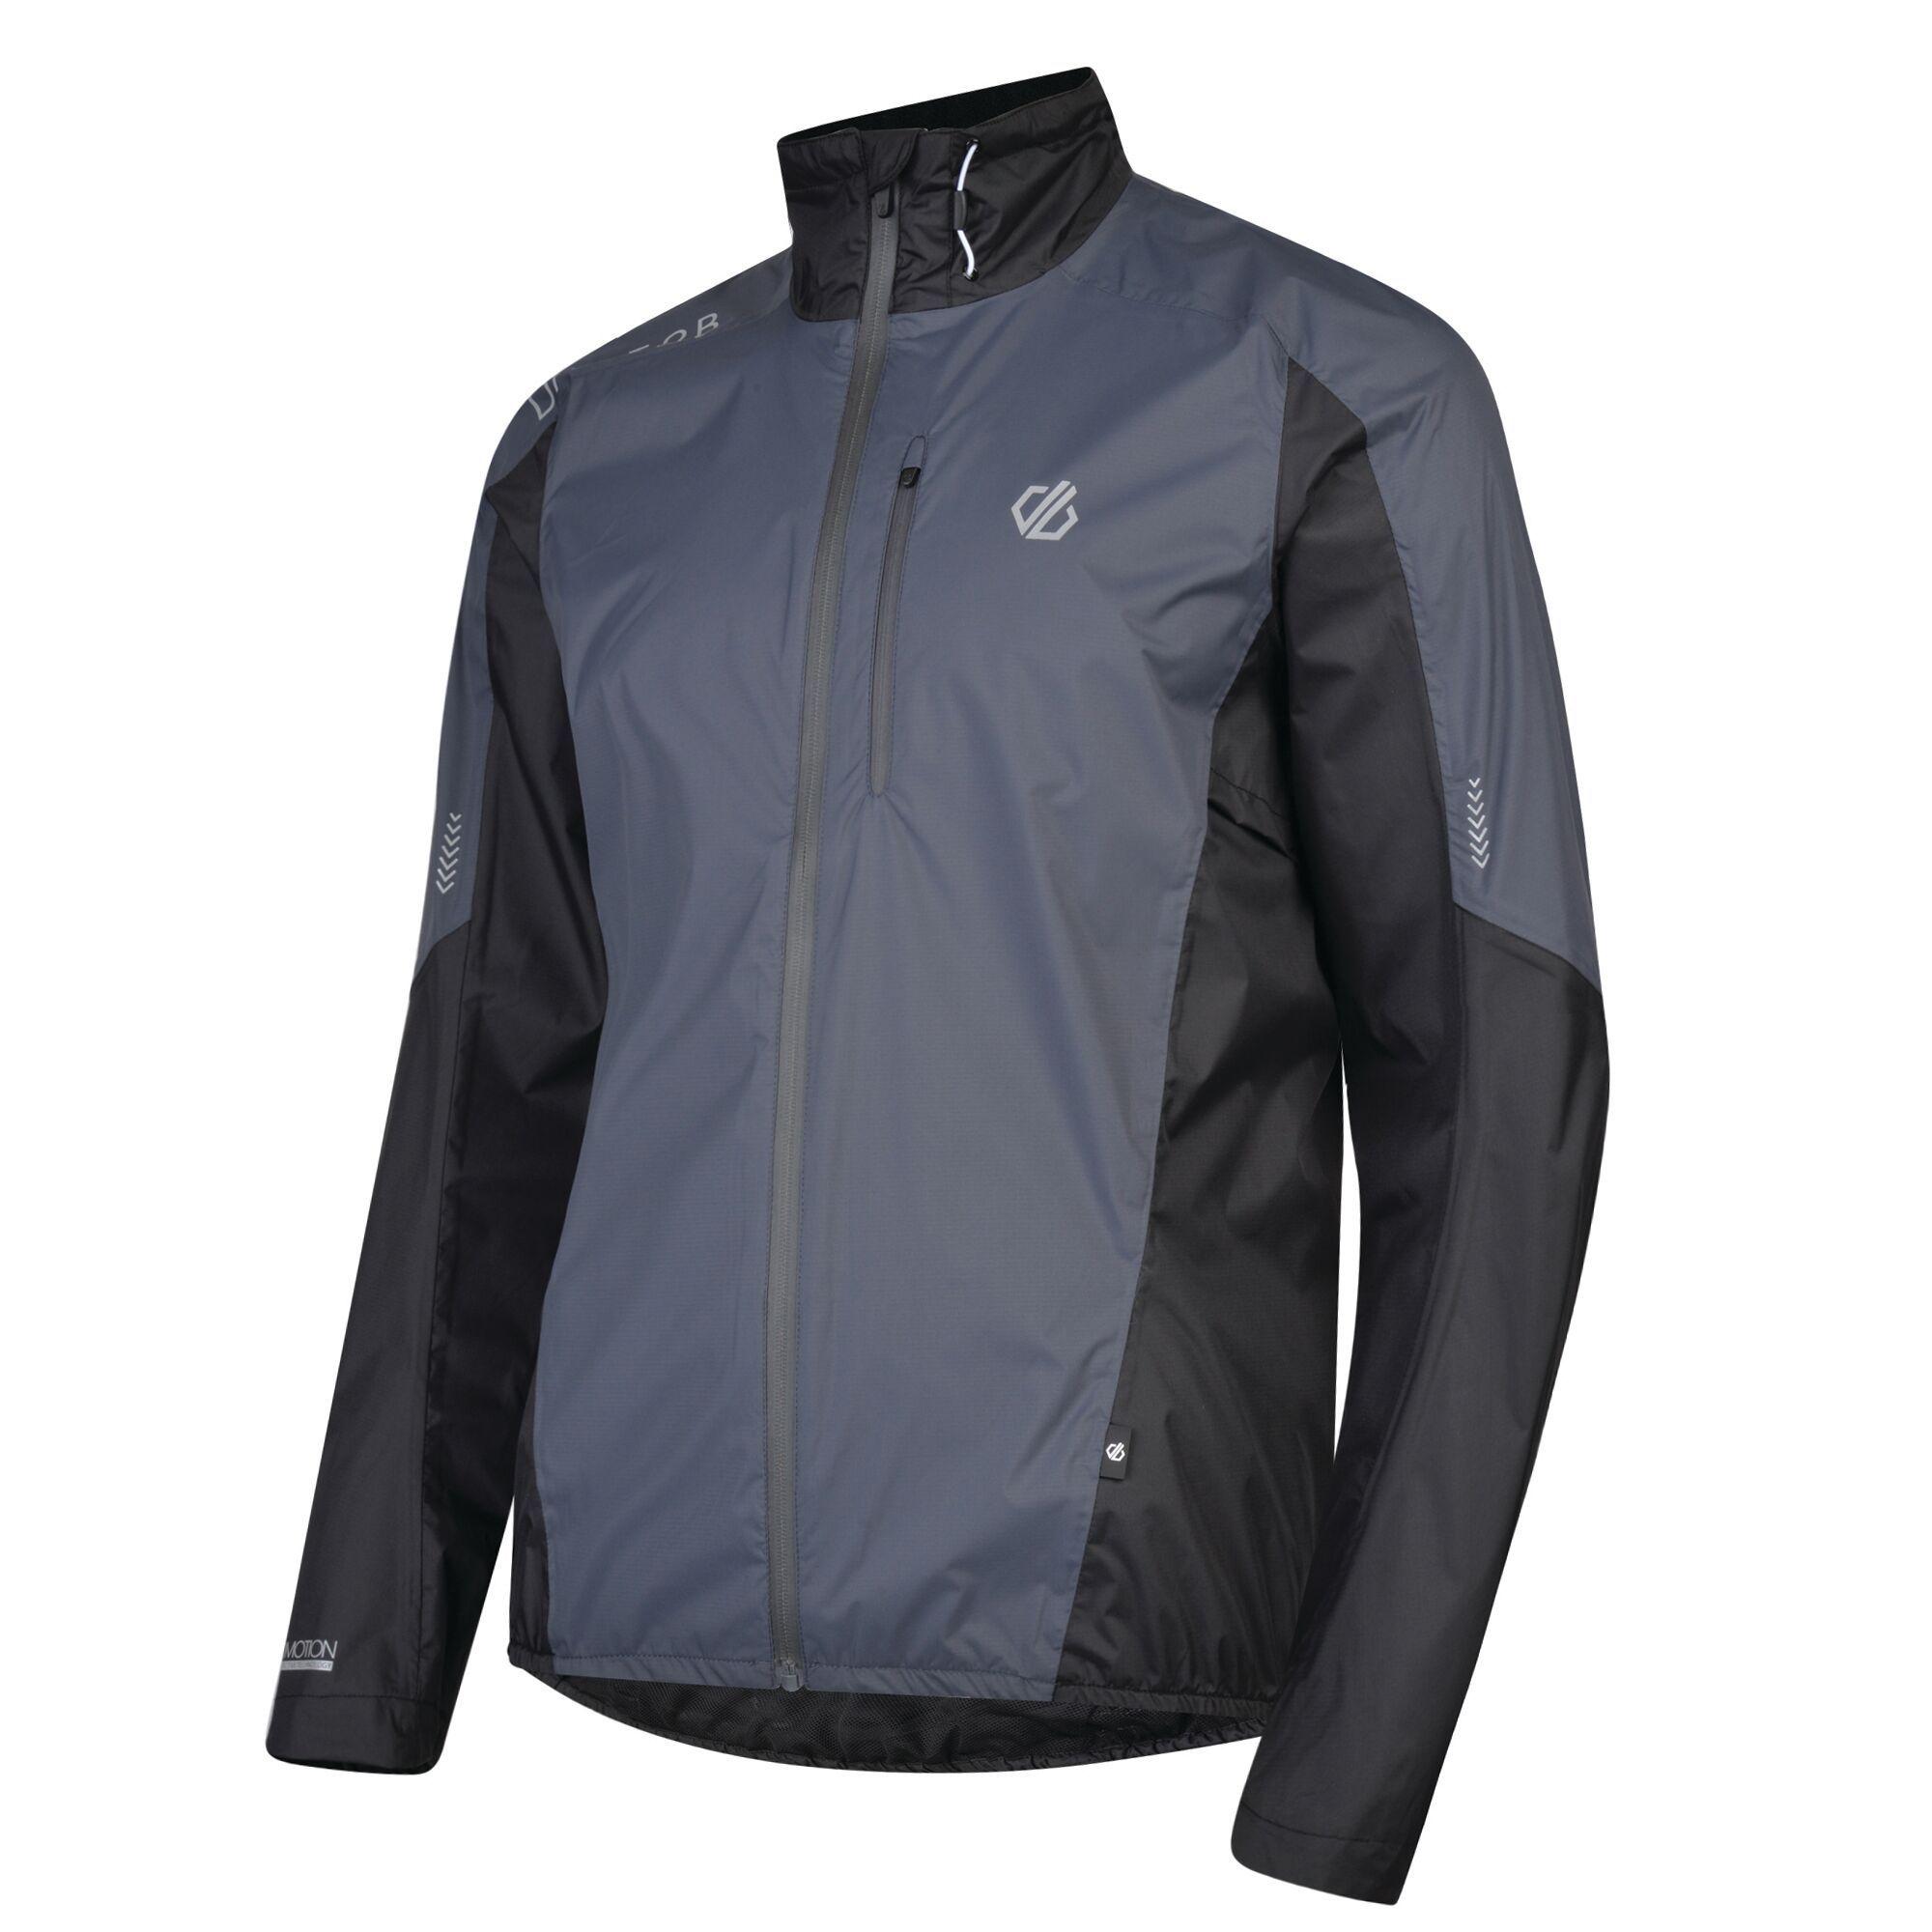 Reflective cycling jackets